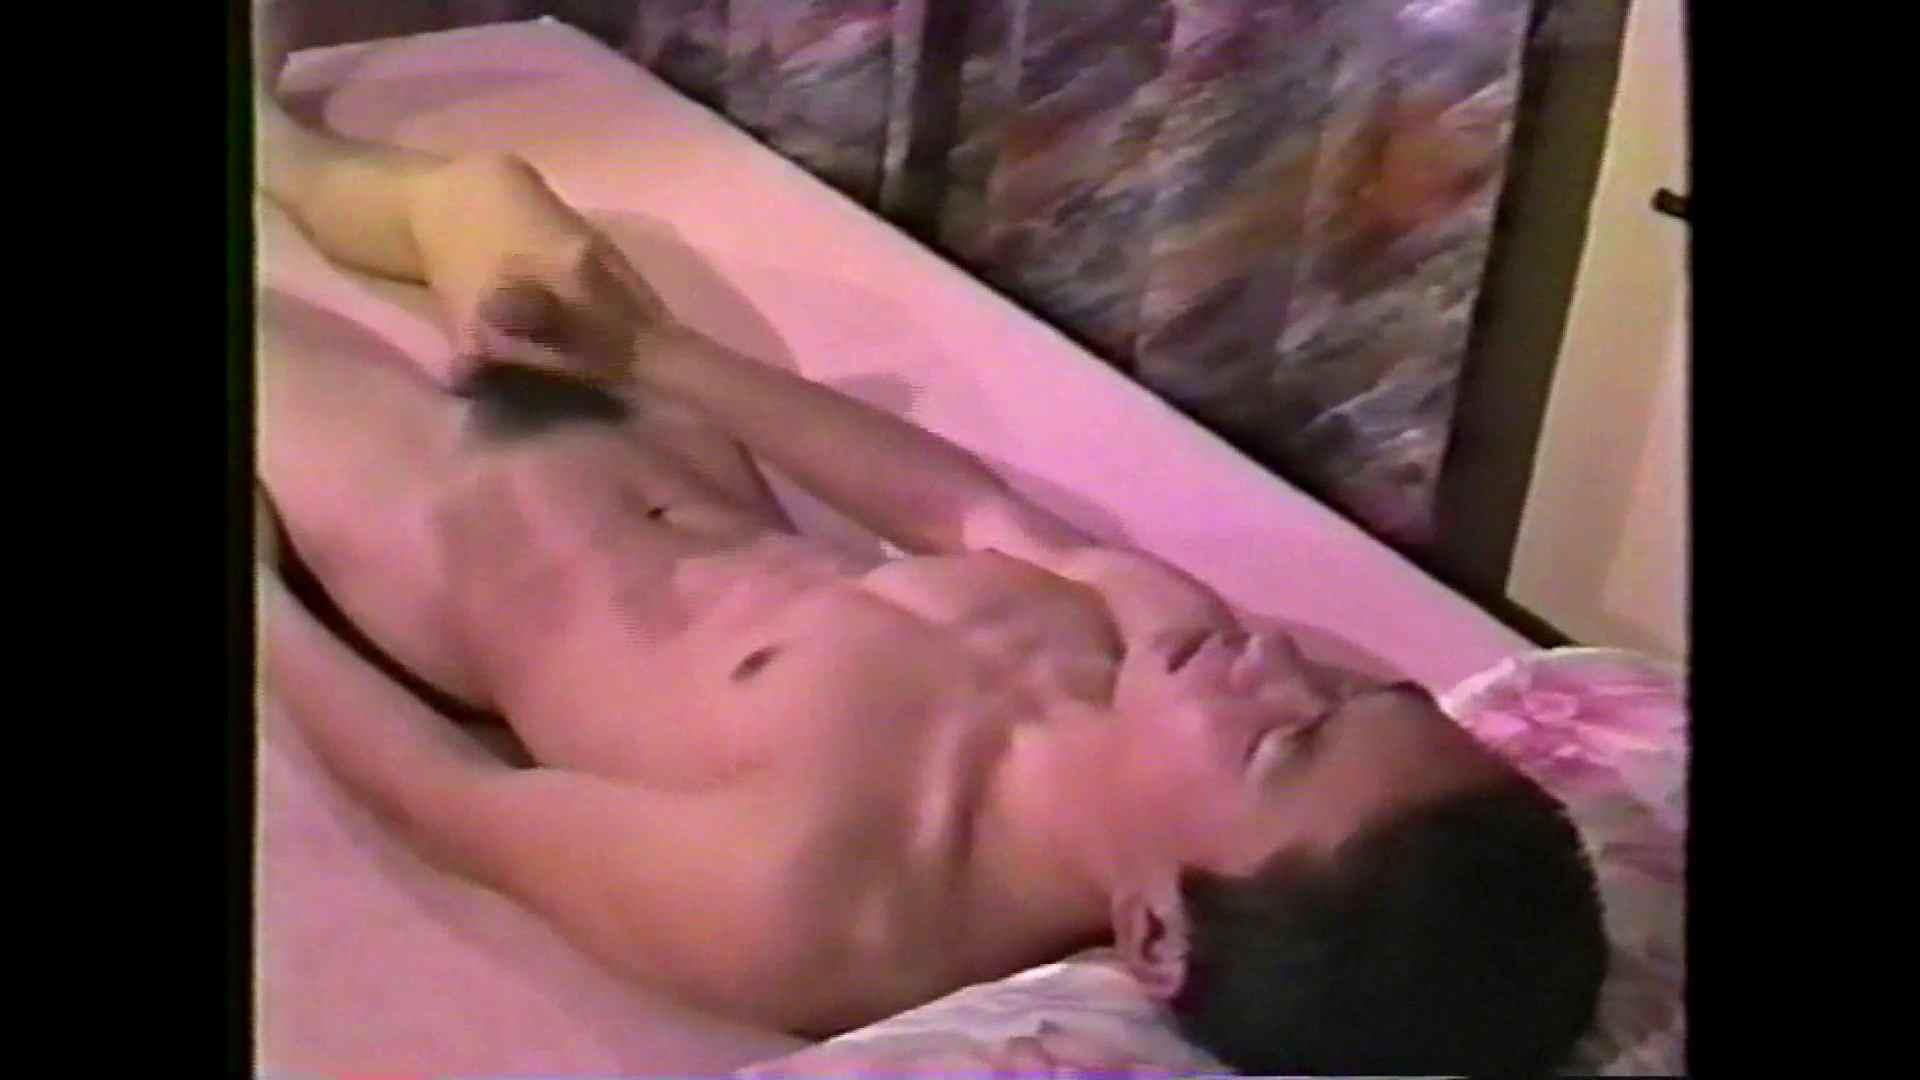 GAYBOY宏のオカズ倉庫Vol.2-2 入浴・シャワー丸見え ゲイセックス画像 108pic 107